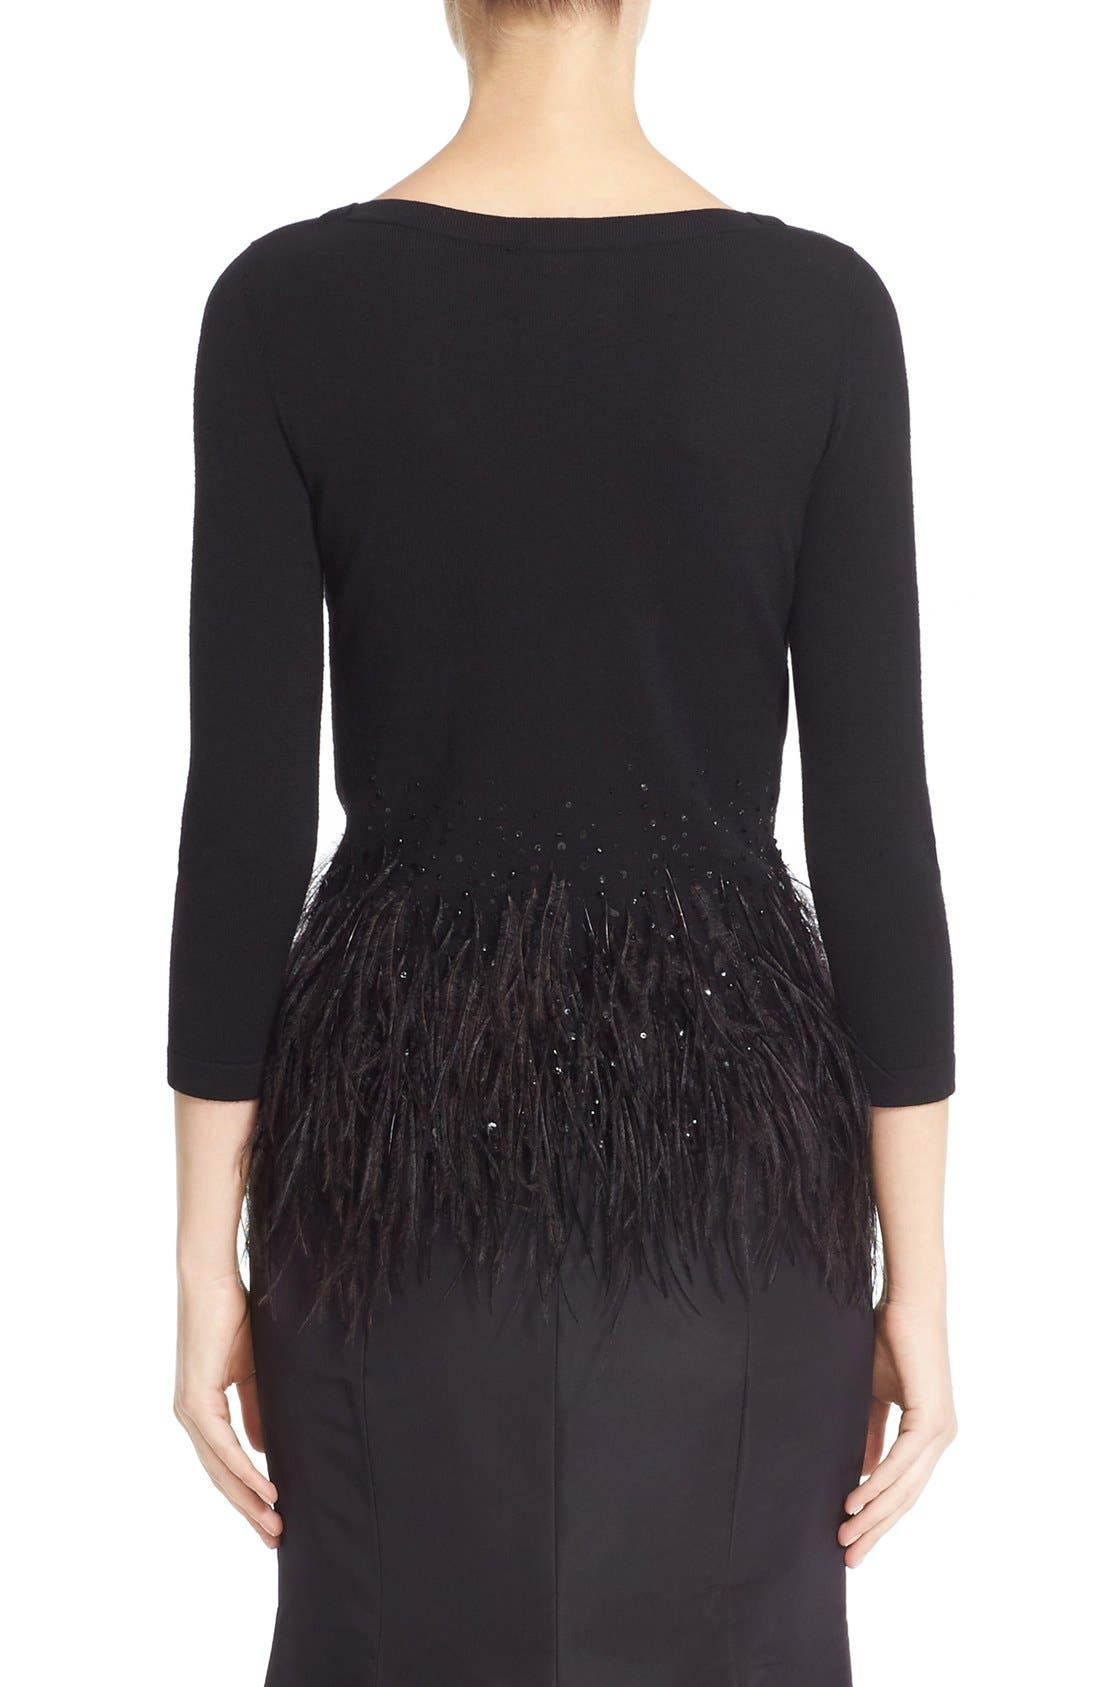 Alternate Image 2  - Carolina Herrera Sequin & Feather Trim Wool Sweater